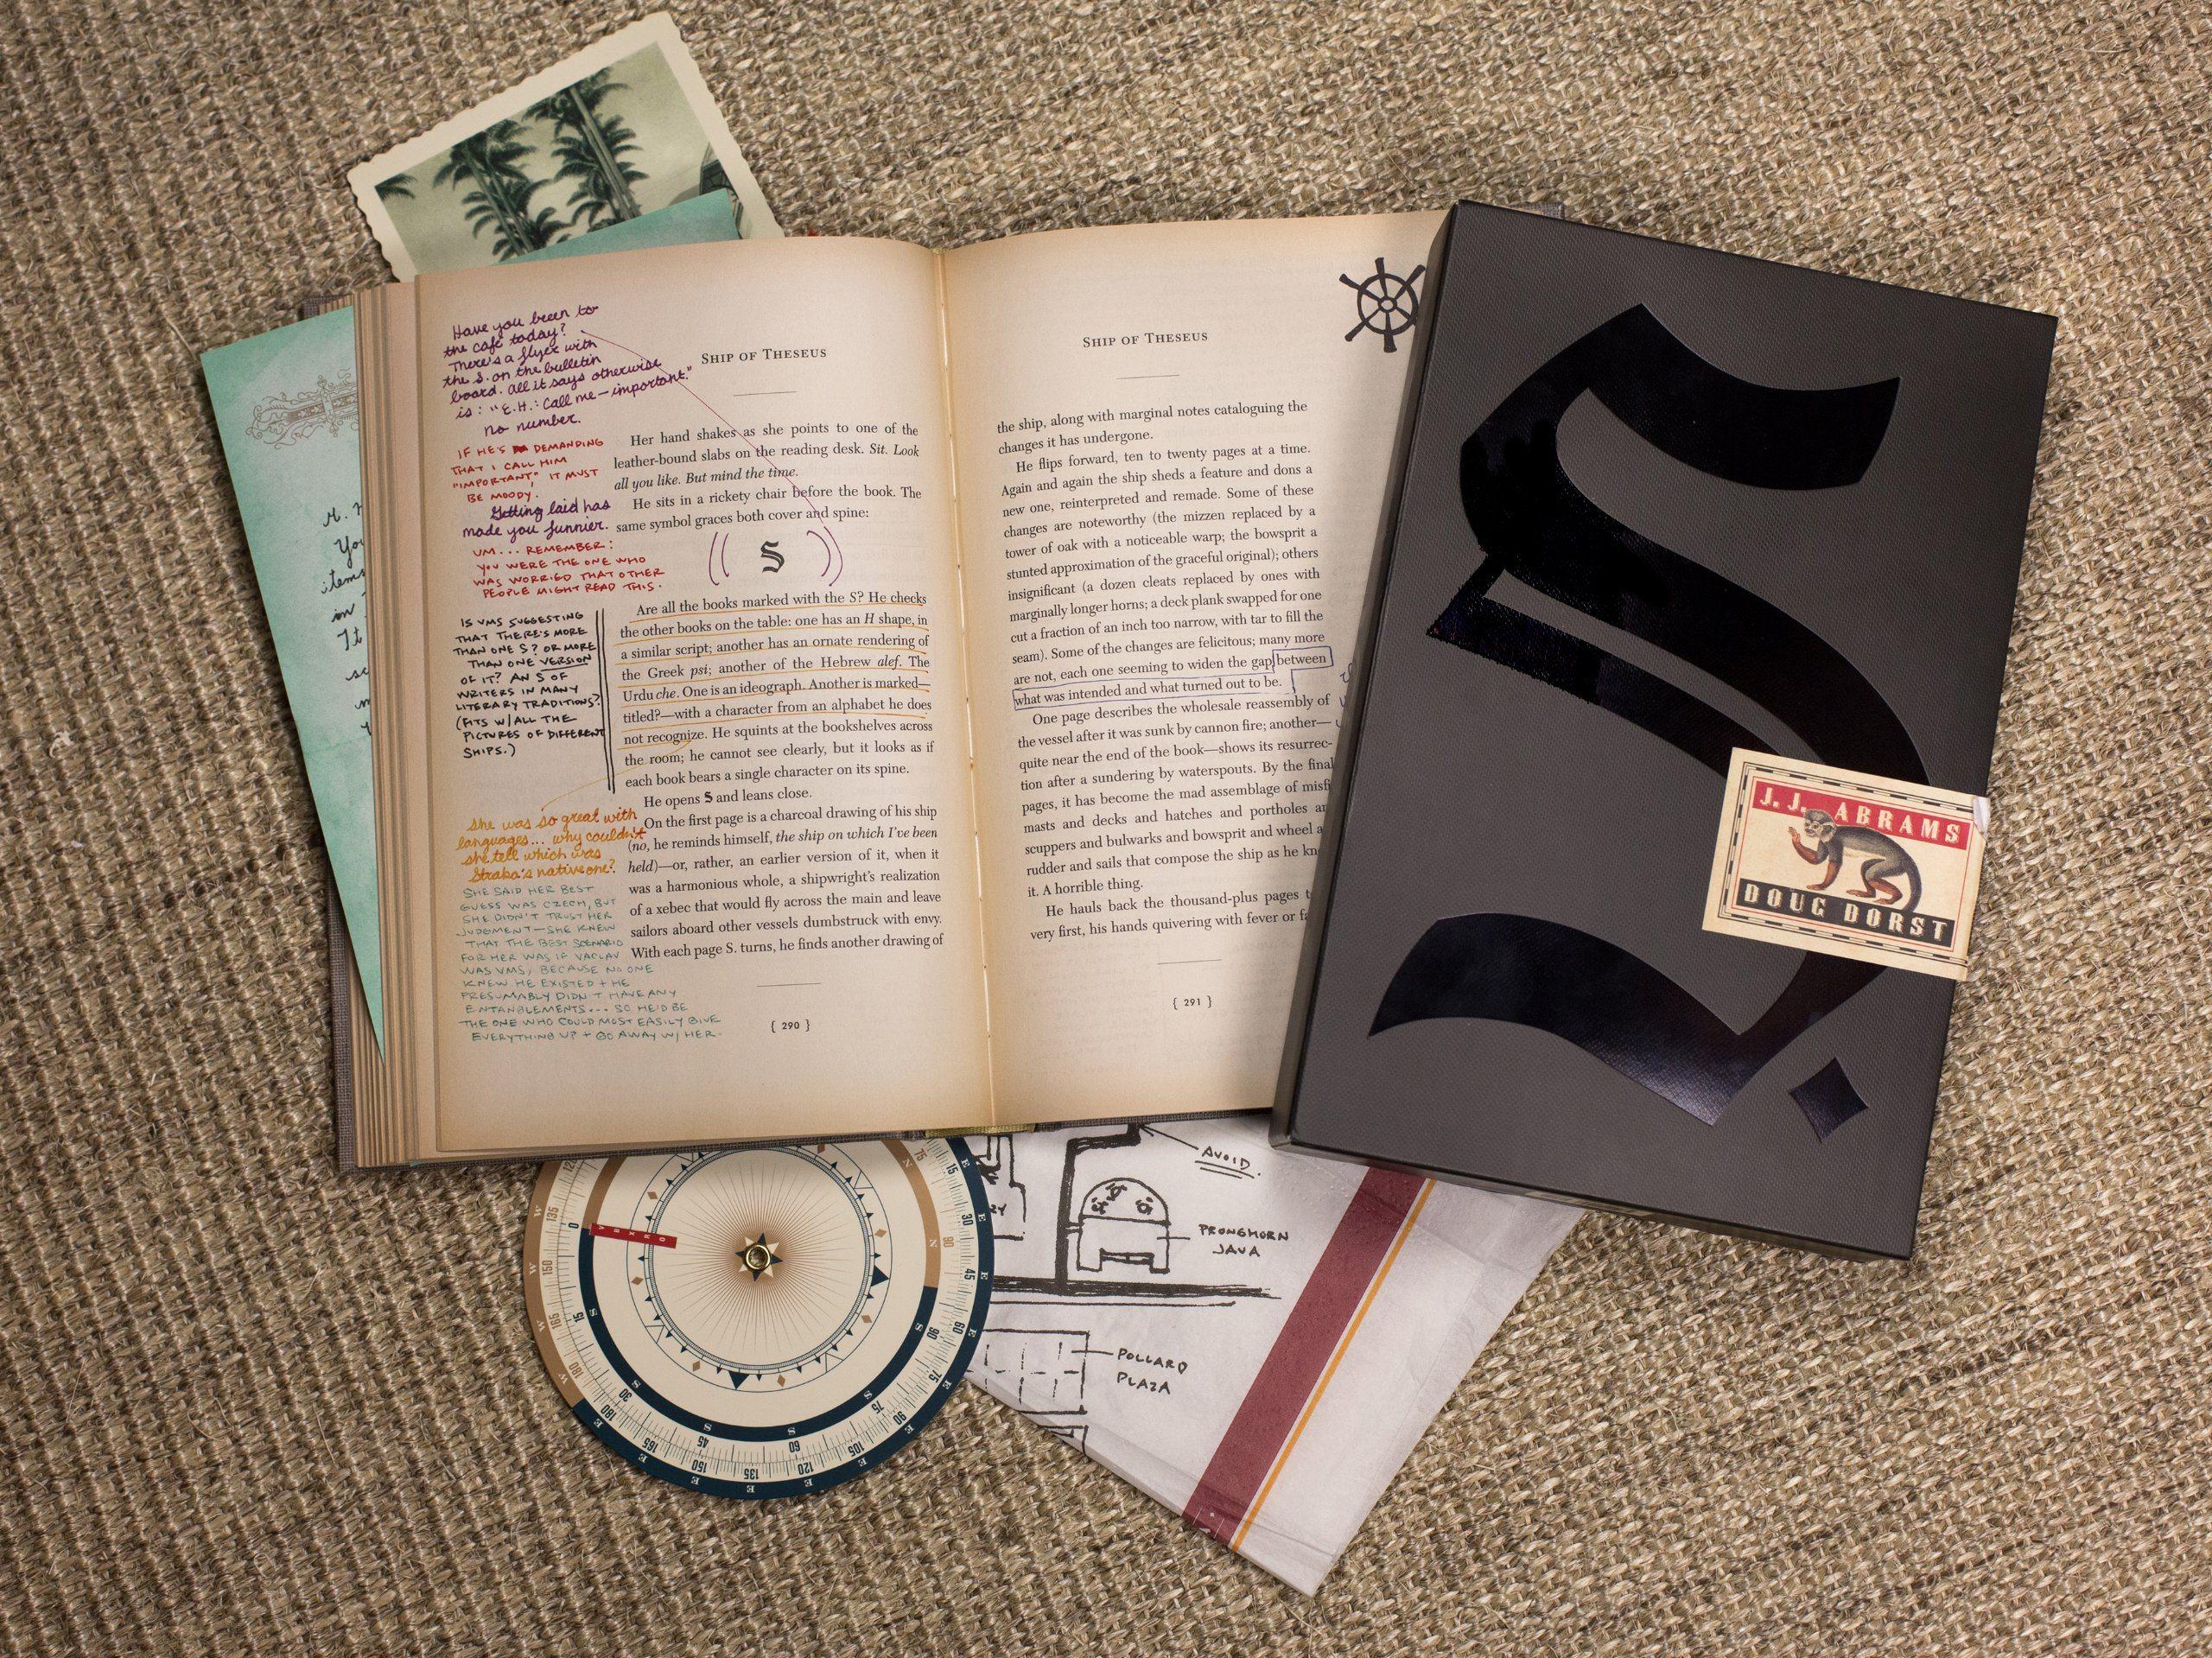 S. by J J Abrams, Doug Dorst